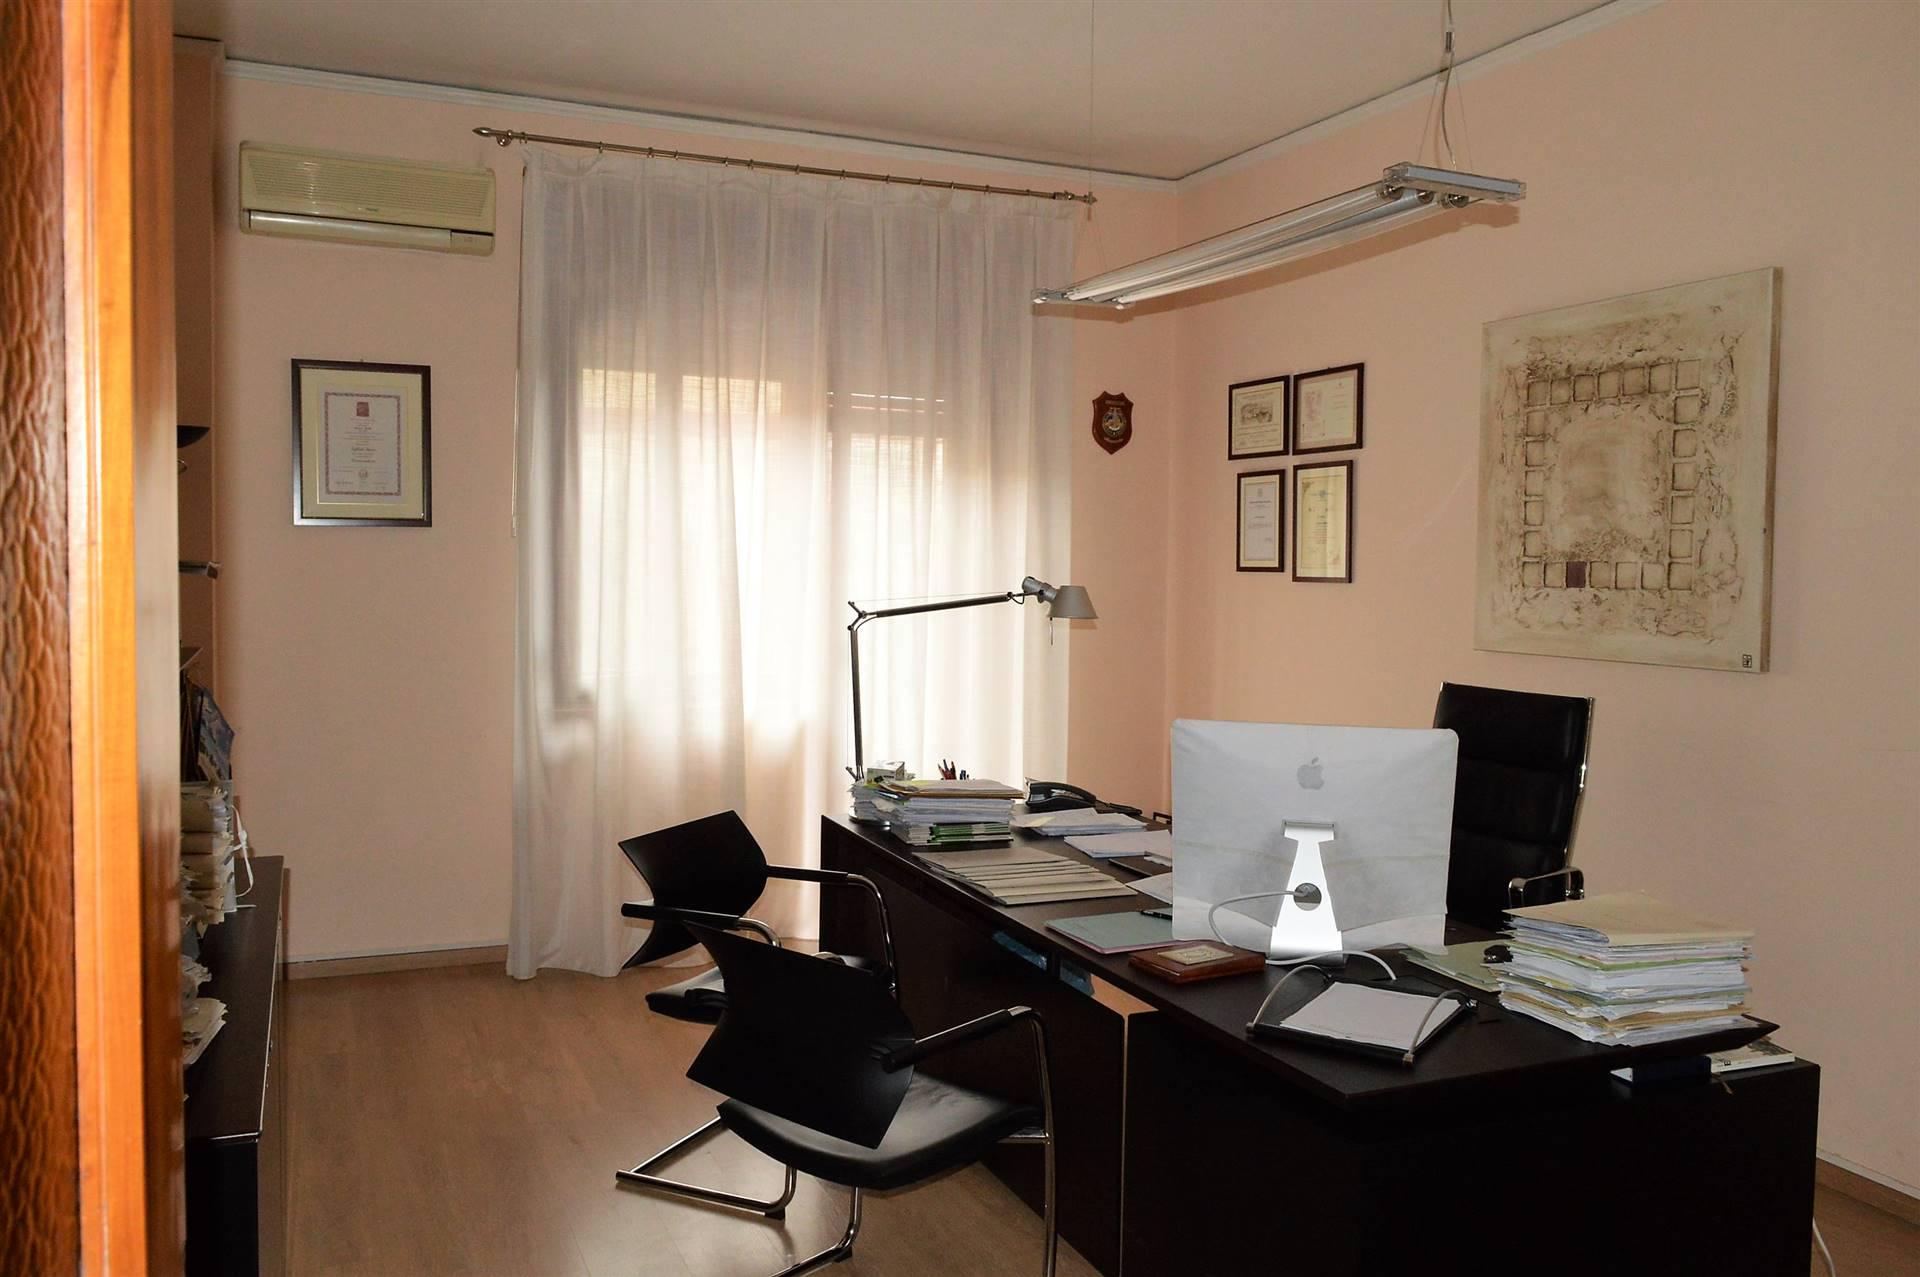 AF851D-Ufficio-SANTA-MARIA-CAPUA-VETERE-Via-Giuseppe-Bonaparte-